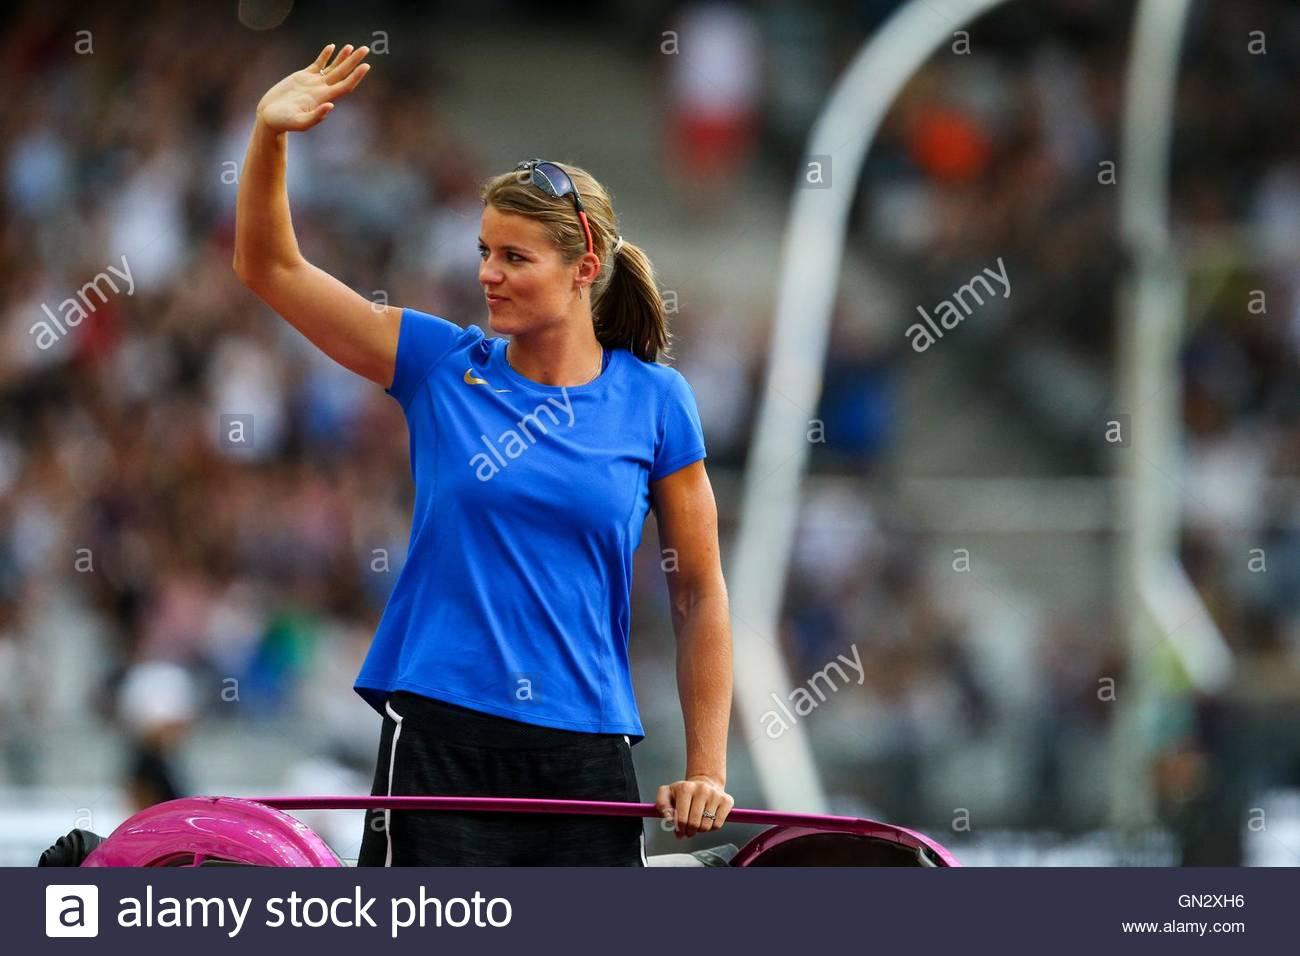 Saint Denis, France. 27th Aug, 2016. Dutch heptathlete Dafne Schippers parades in the Stade de France on August - Stock Image